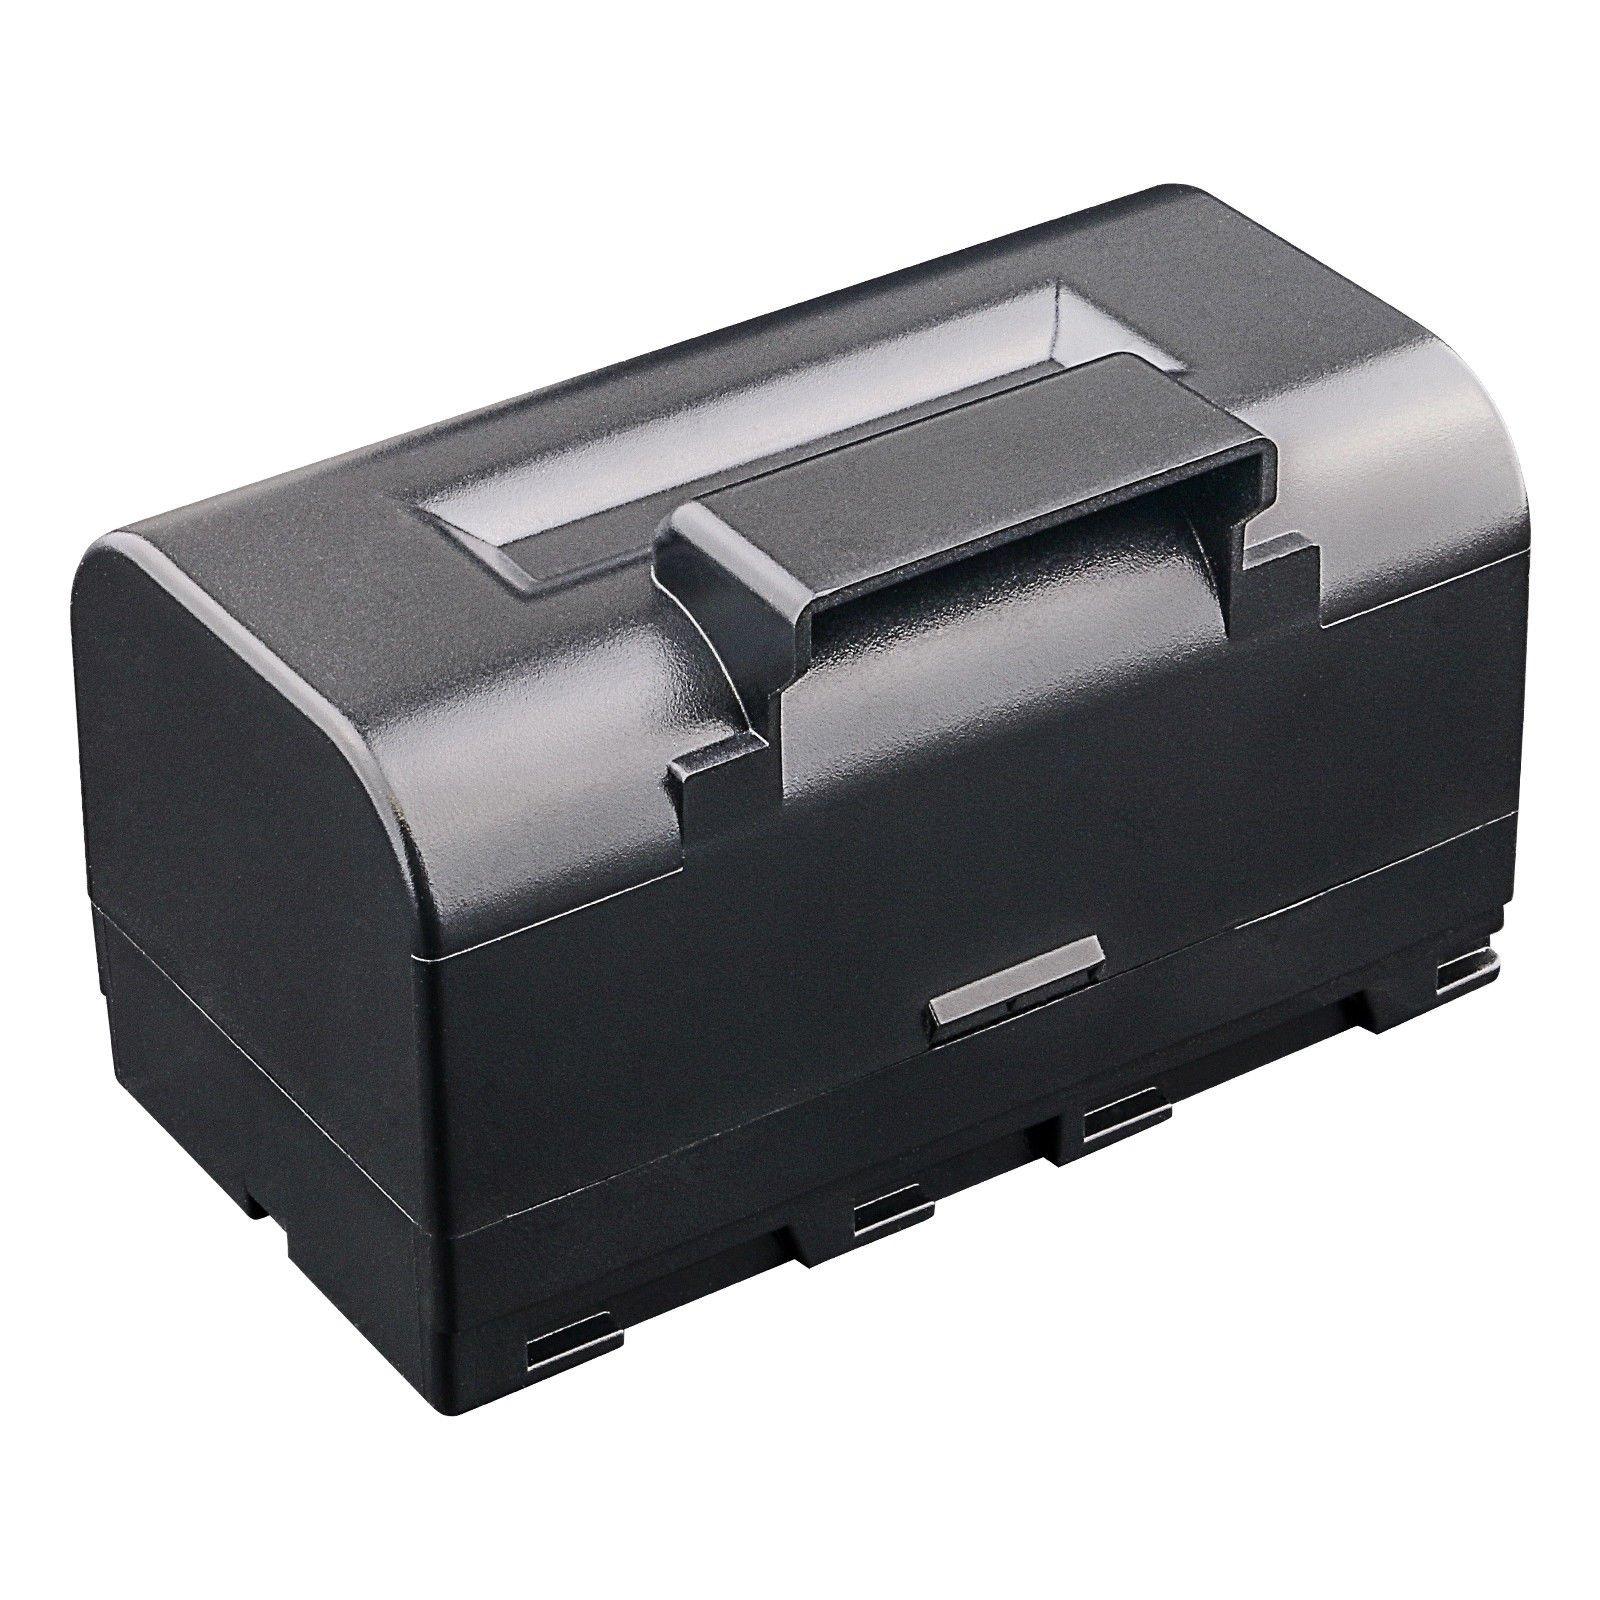 Kastar High Capacity Battery 1 Pack for Topcon BT-65Q, Topcon BC-30 BC-30D BT-30, Topcon Total Stations FC-200 FC-2200 FC-2500 GPT-7000i GTS-750 GTS-751 GPT-7500 GTS-900 GPT-9000